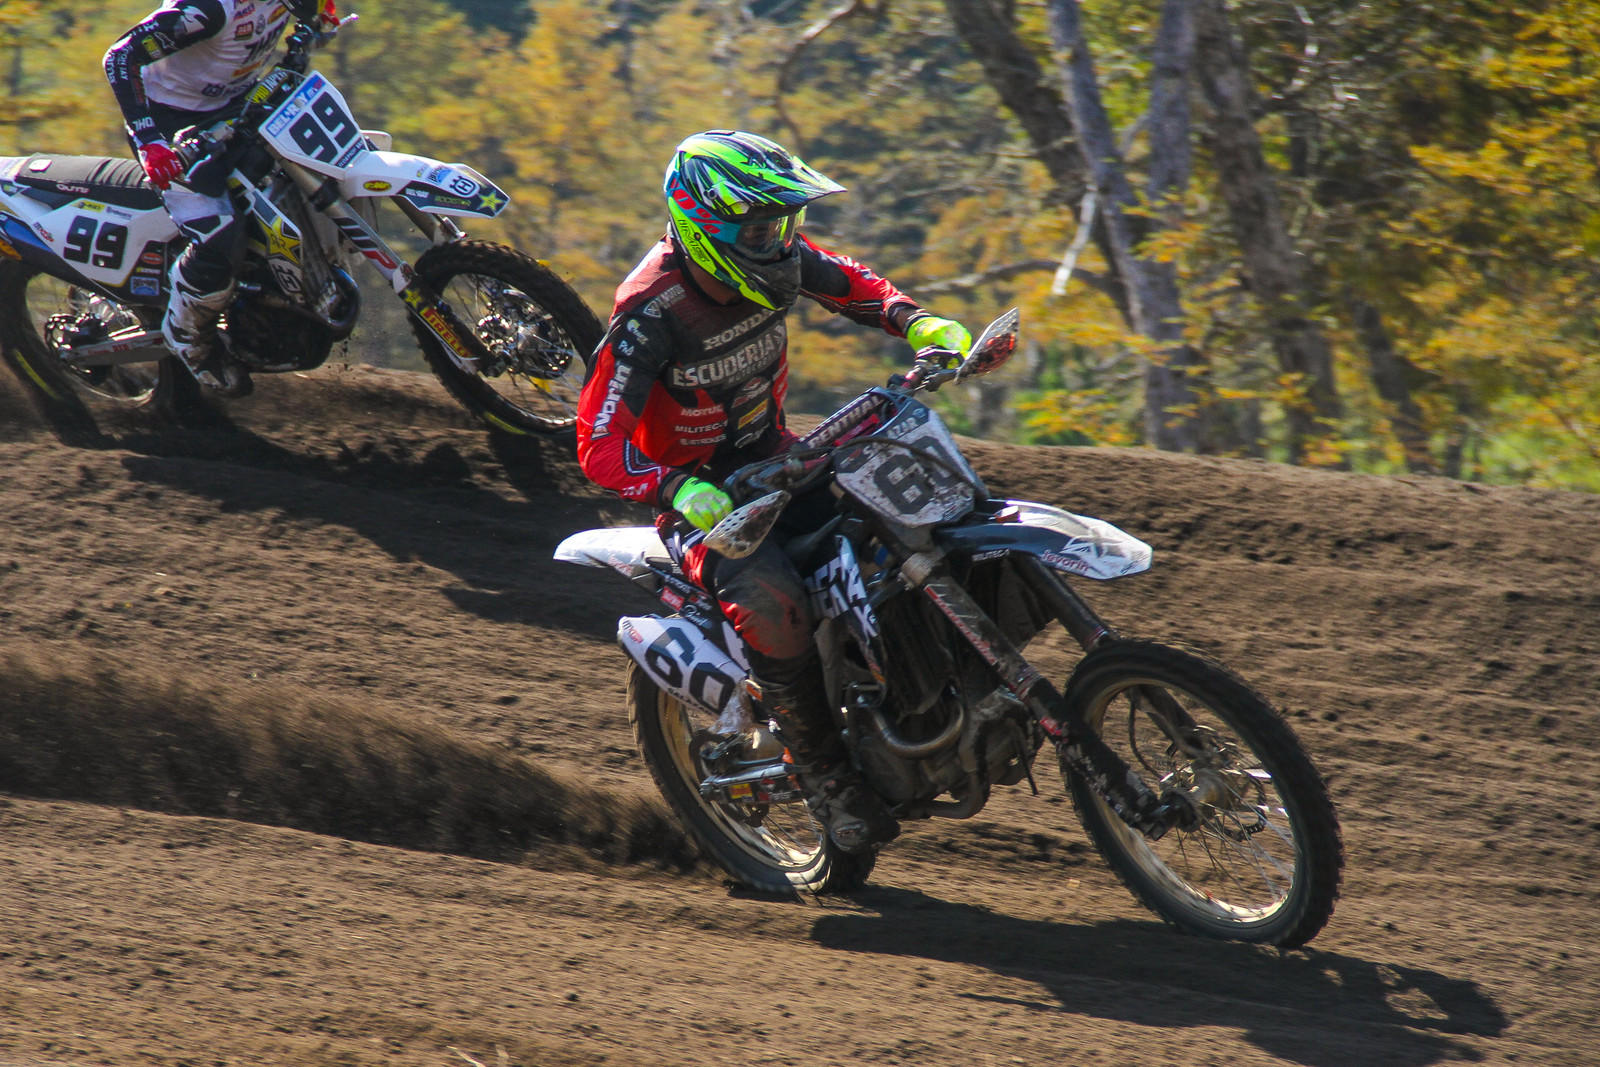 Jetro Salazar - Photo Blast: 2017 MXGP of Argentina - Motocross Pictures - Vital MX